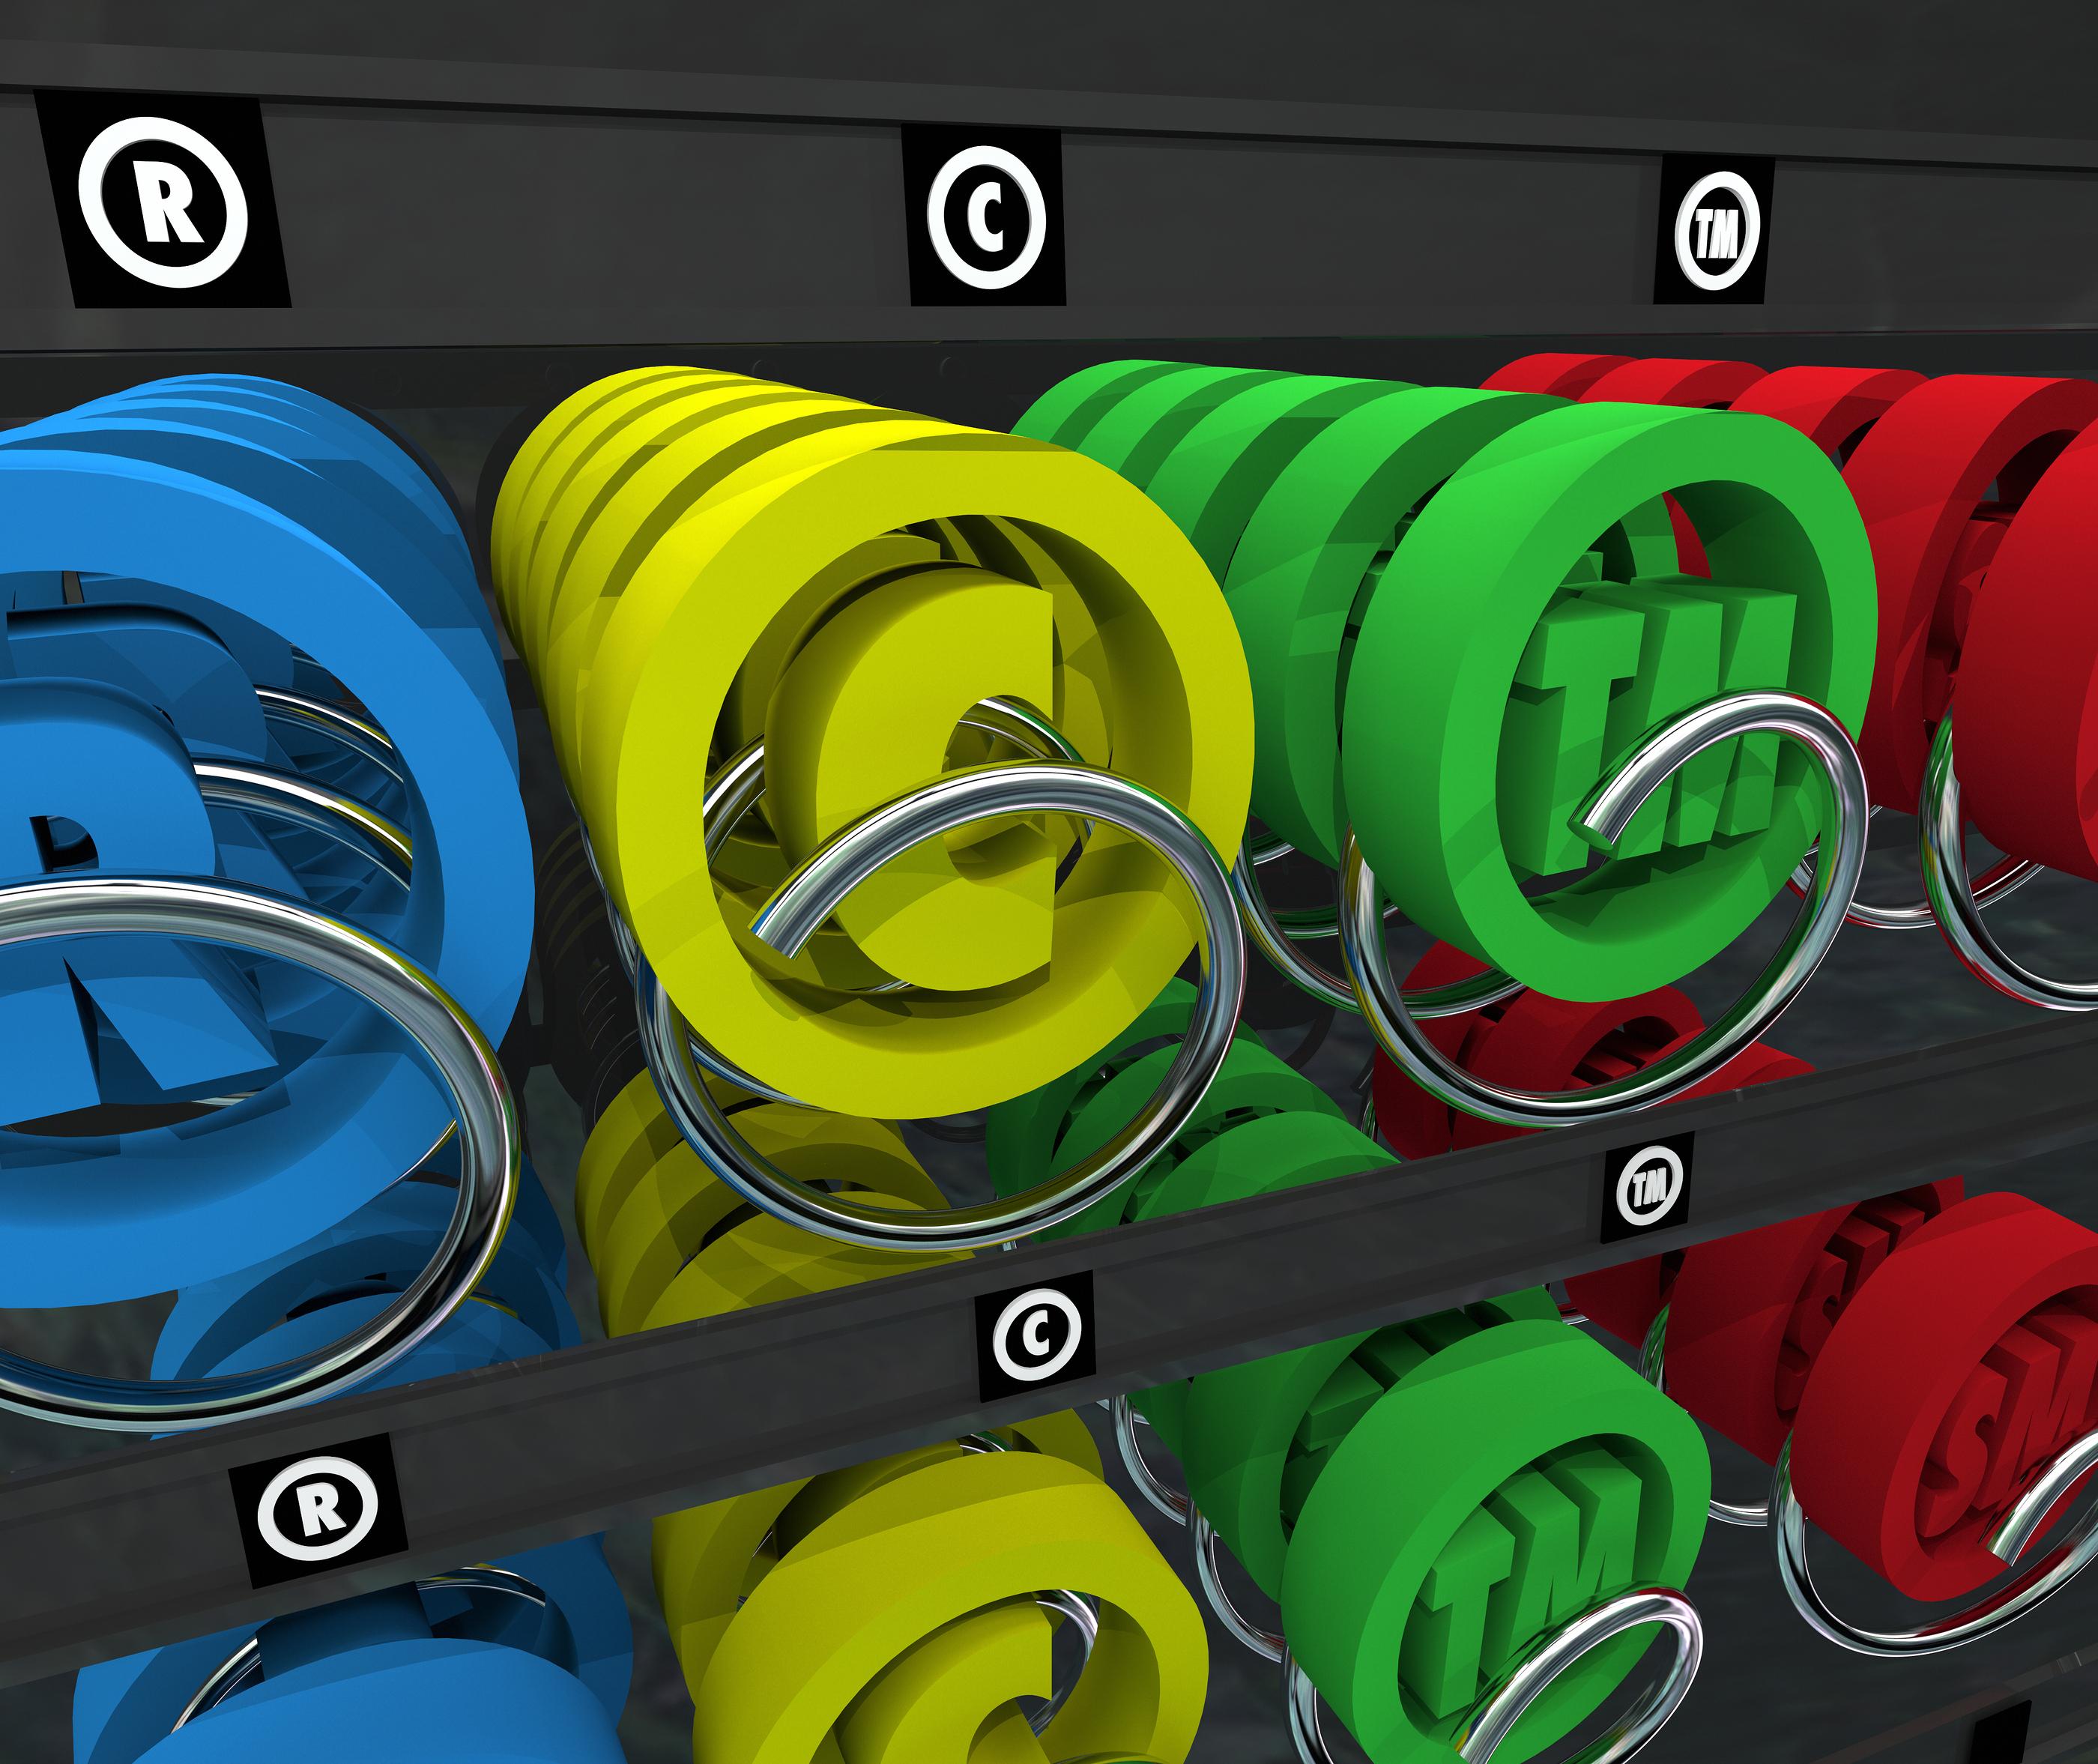 Copyright and Trademark vending machine